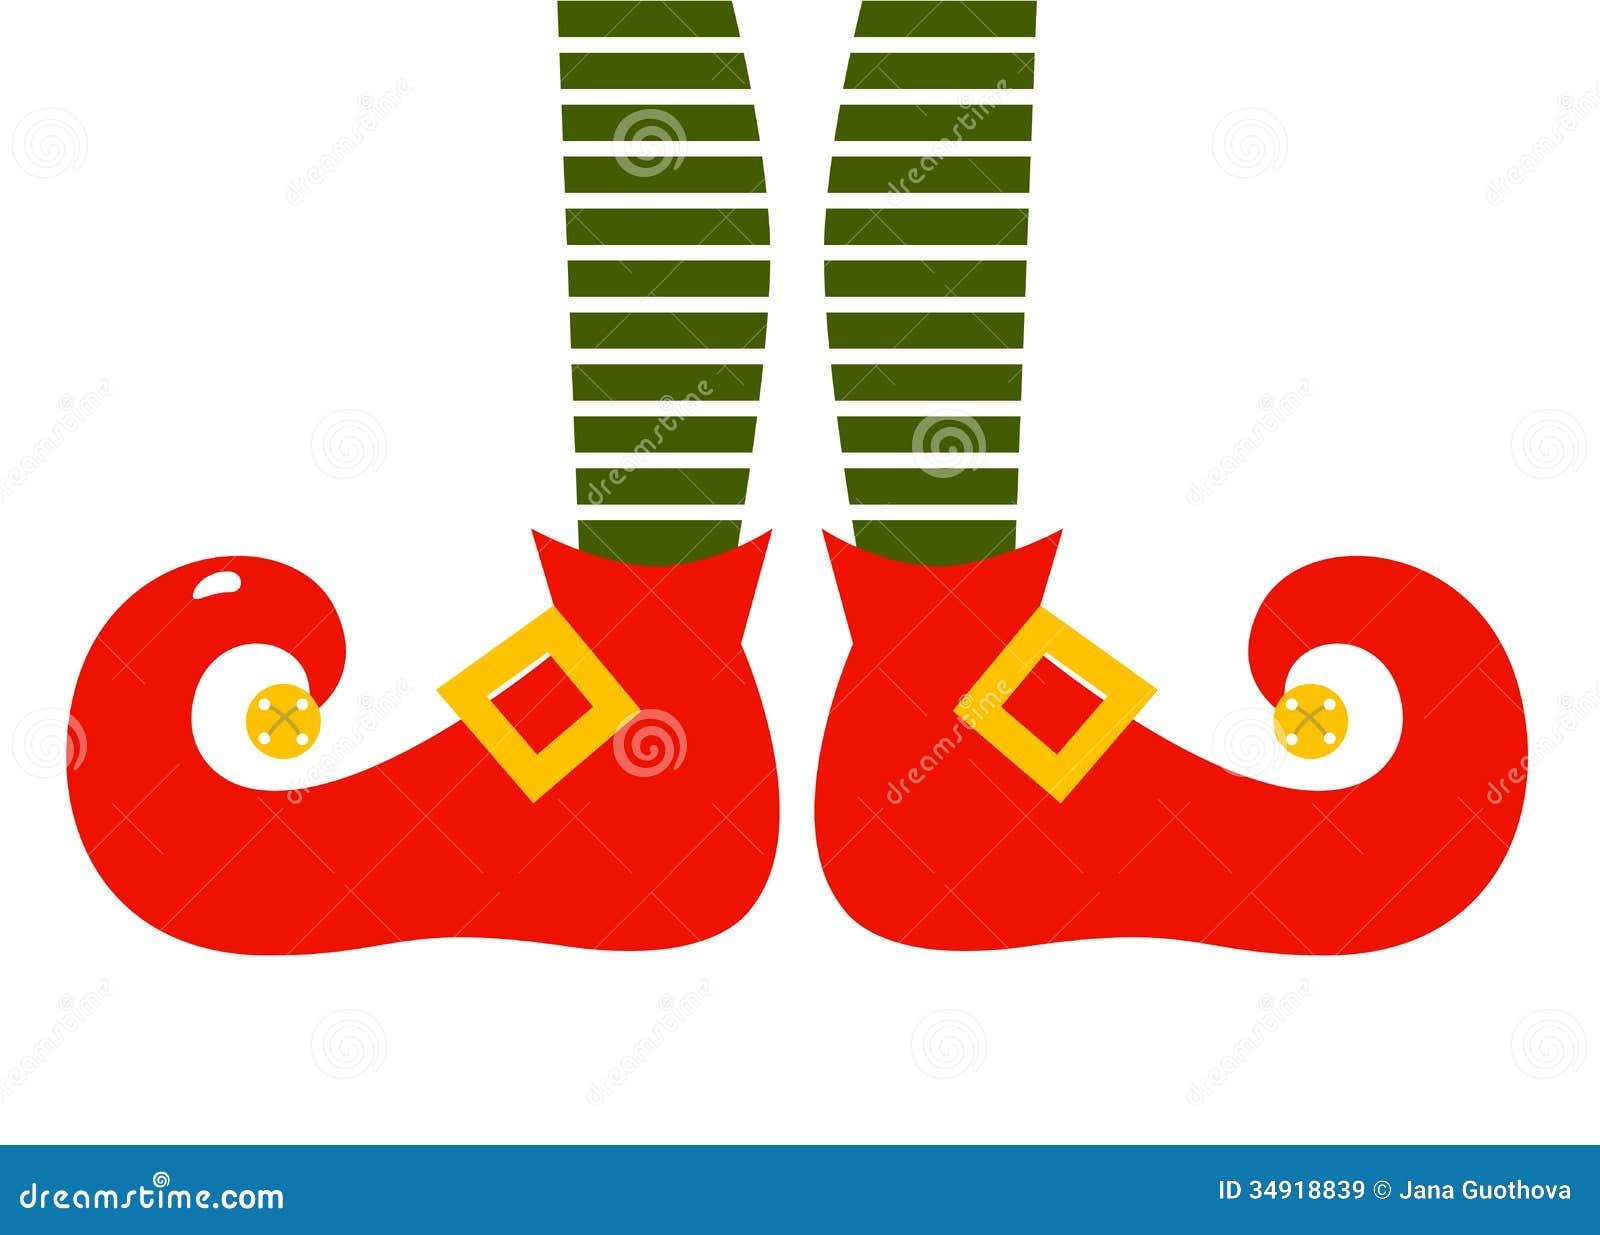 elvish legs with striped patterned pants vector illustration mr no pr ...